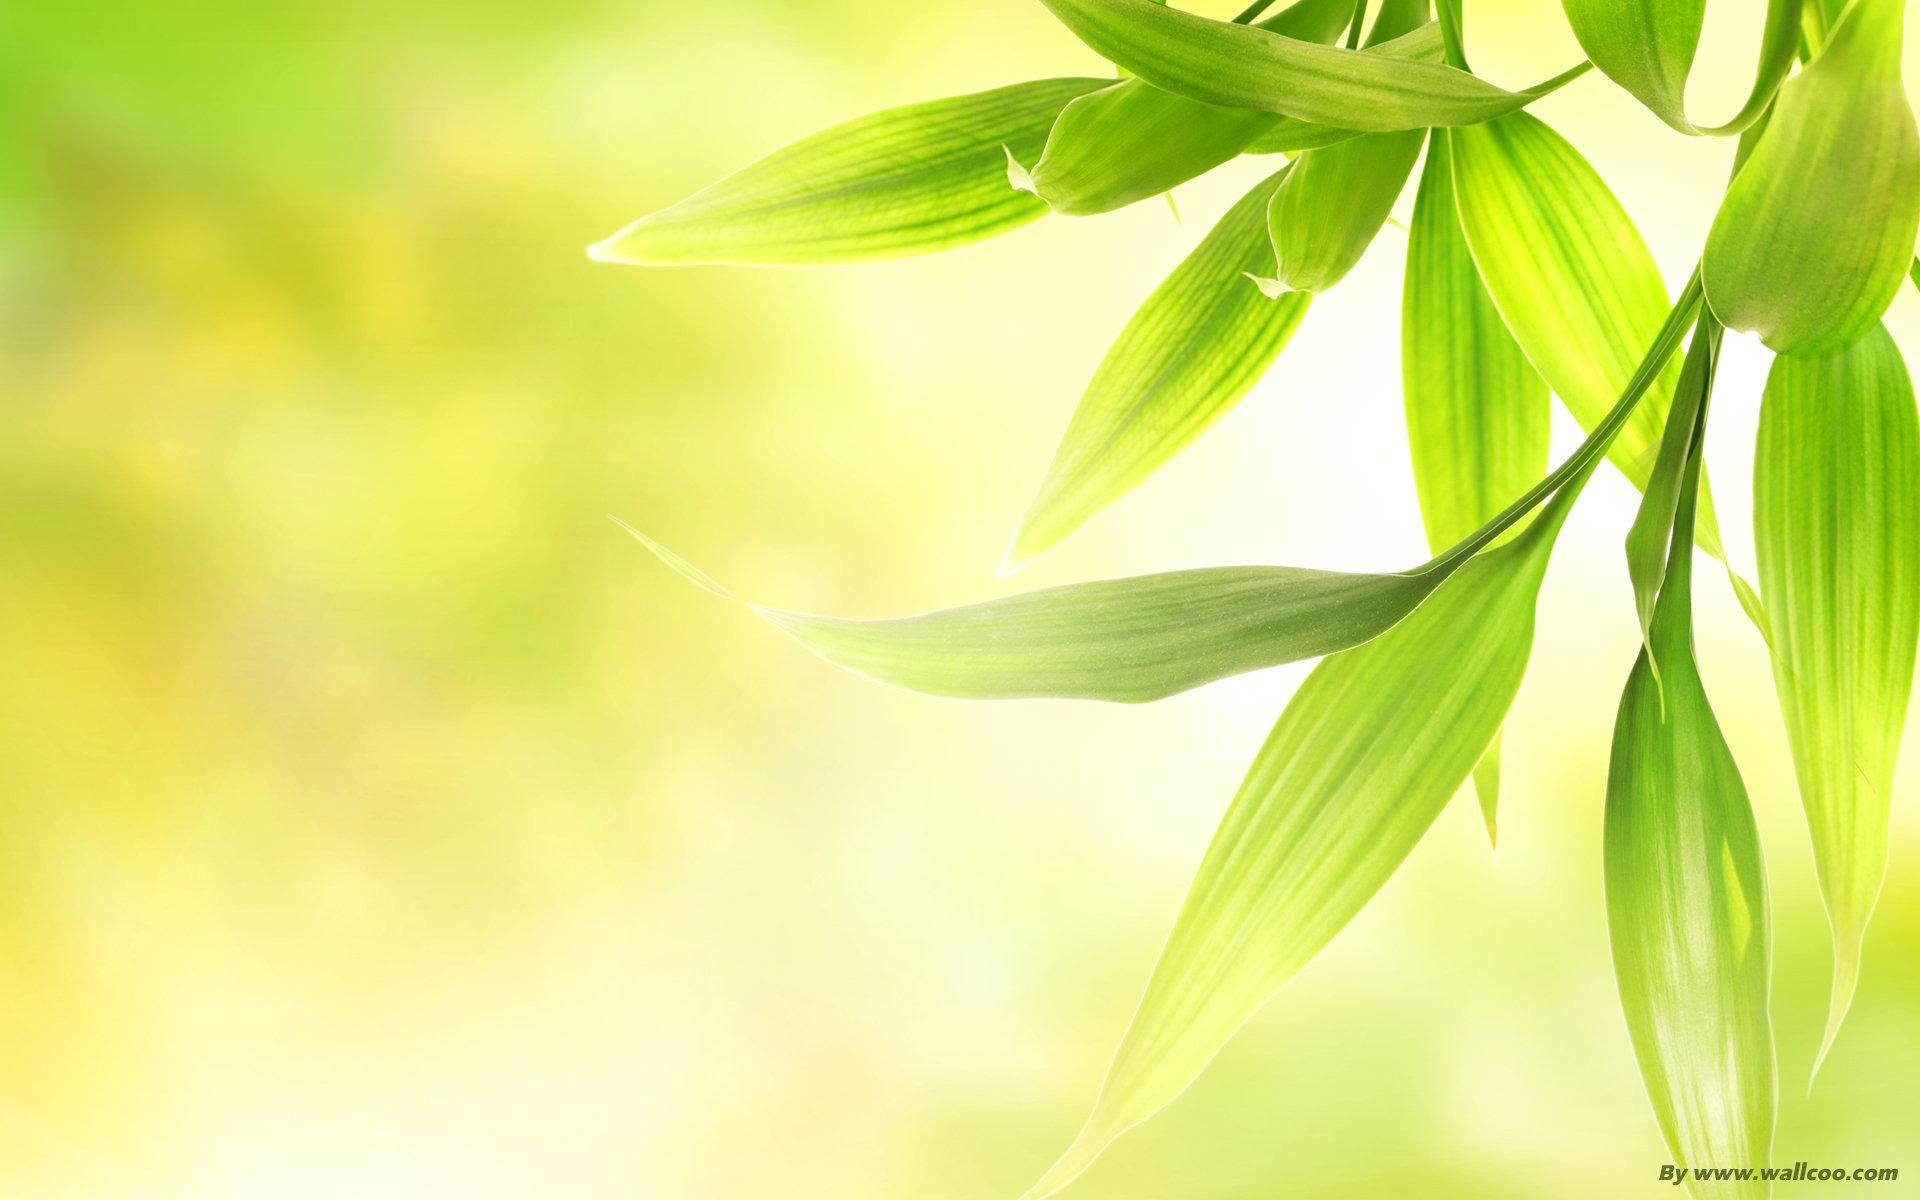 Description: fresh green-fresh dim green leaves Current Size: 1920 x ...: www.10wallpaper.com/down/fresh_green-fresh_dim_green_leaves...